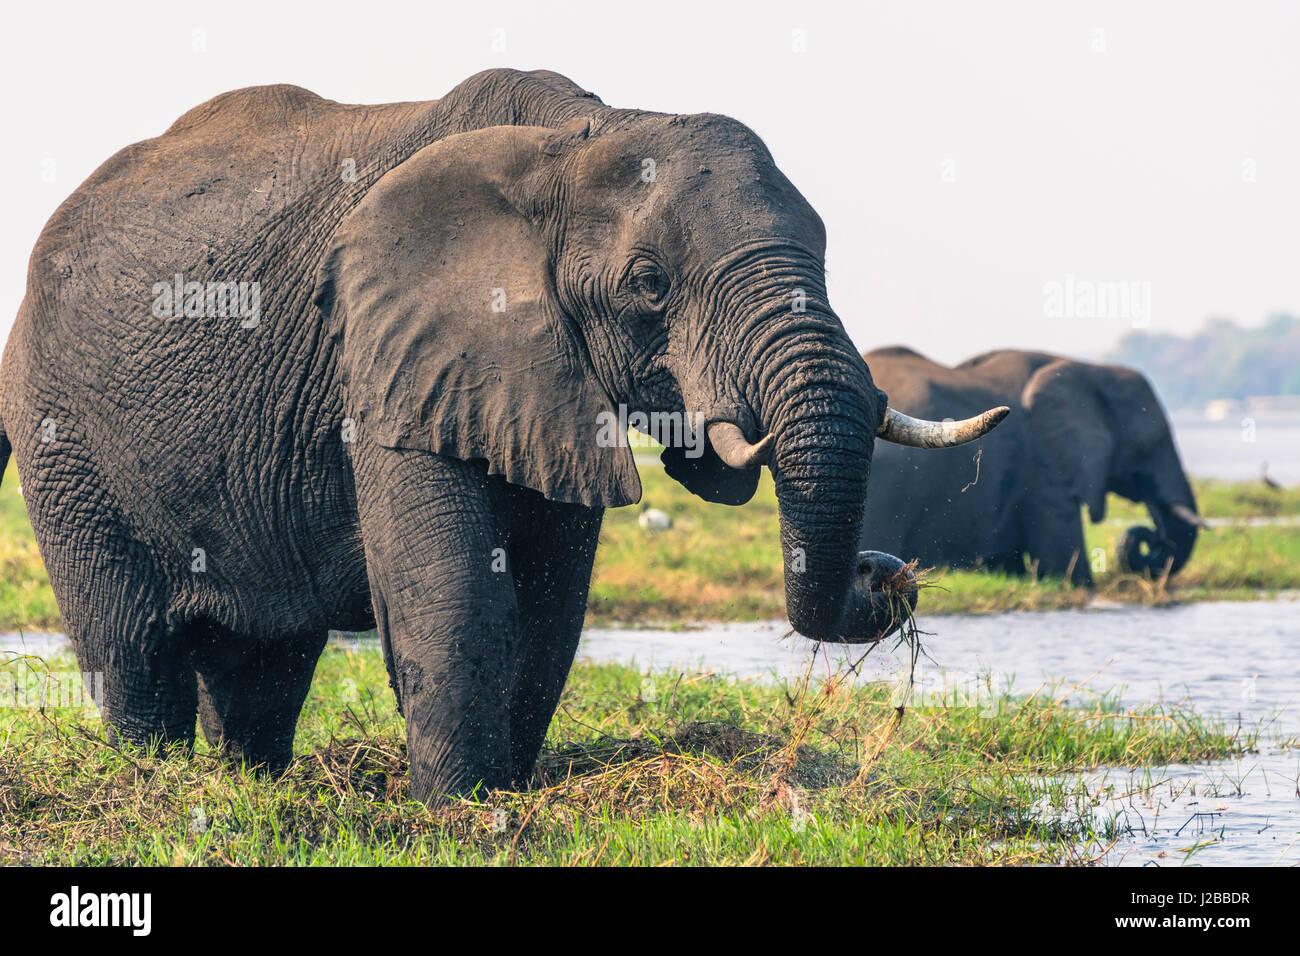 Botswana. Chobe National Park. Elefant (Loxodonta Africana) Weiden auf einer Insel im Chobe Fluss. Stockbild